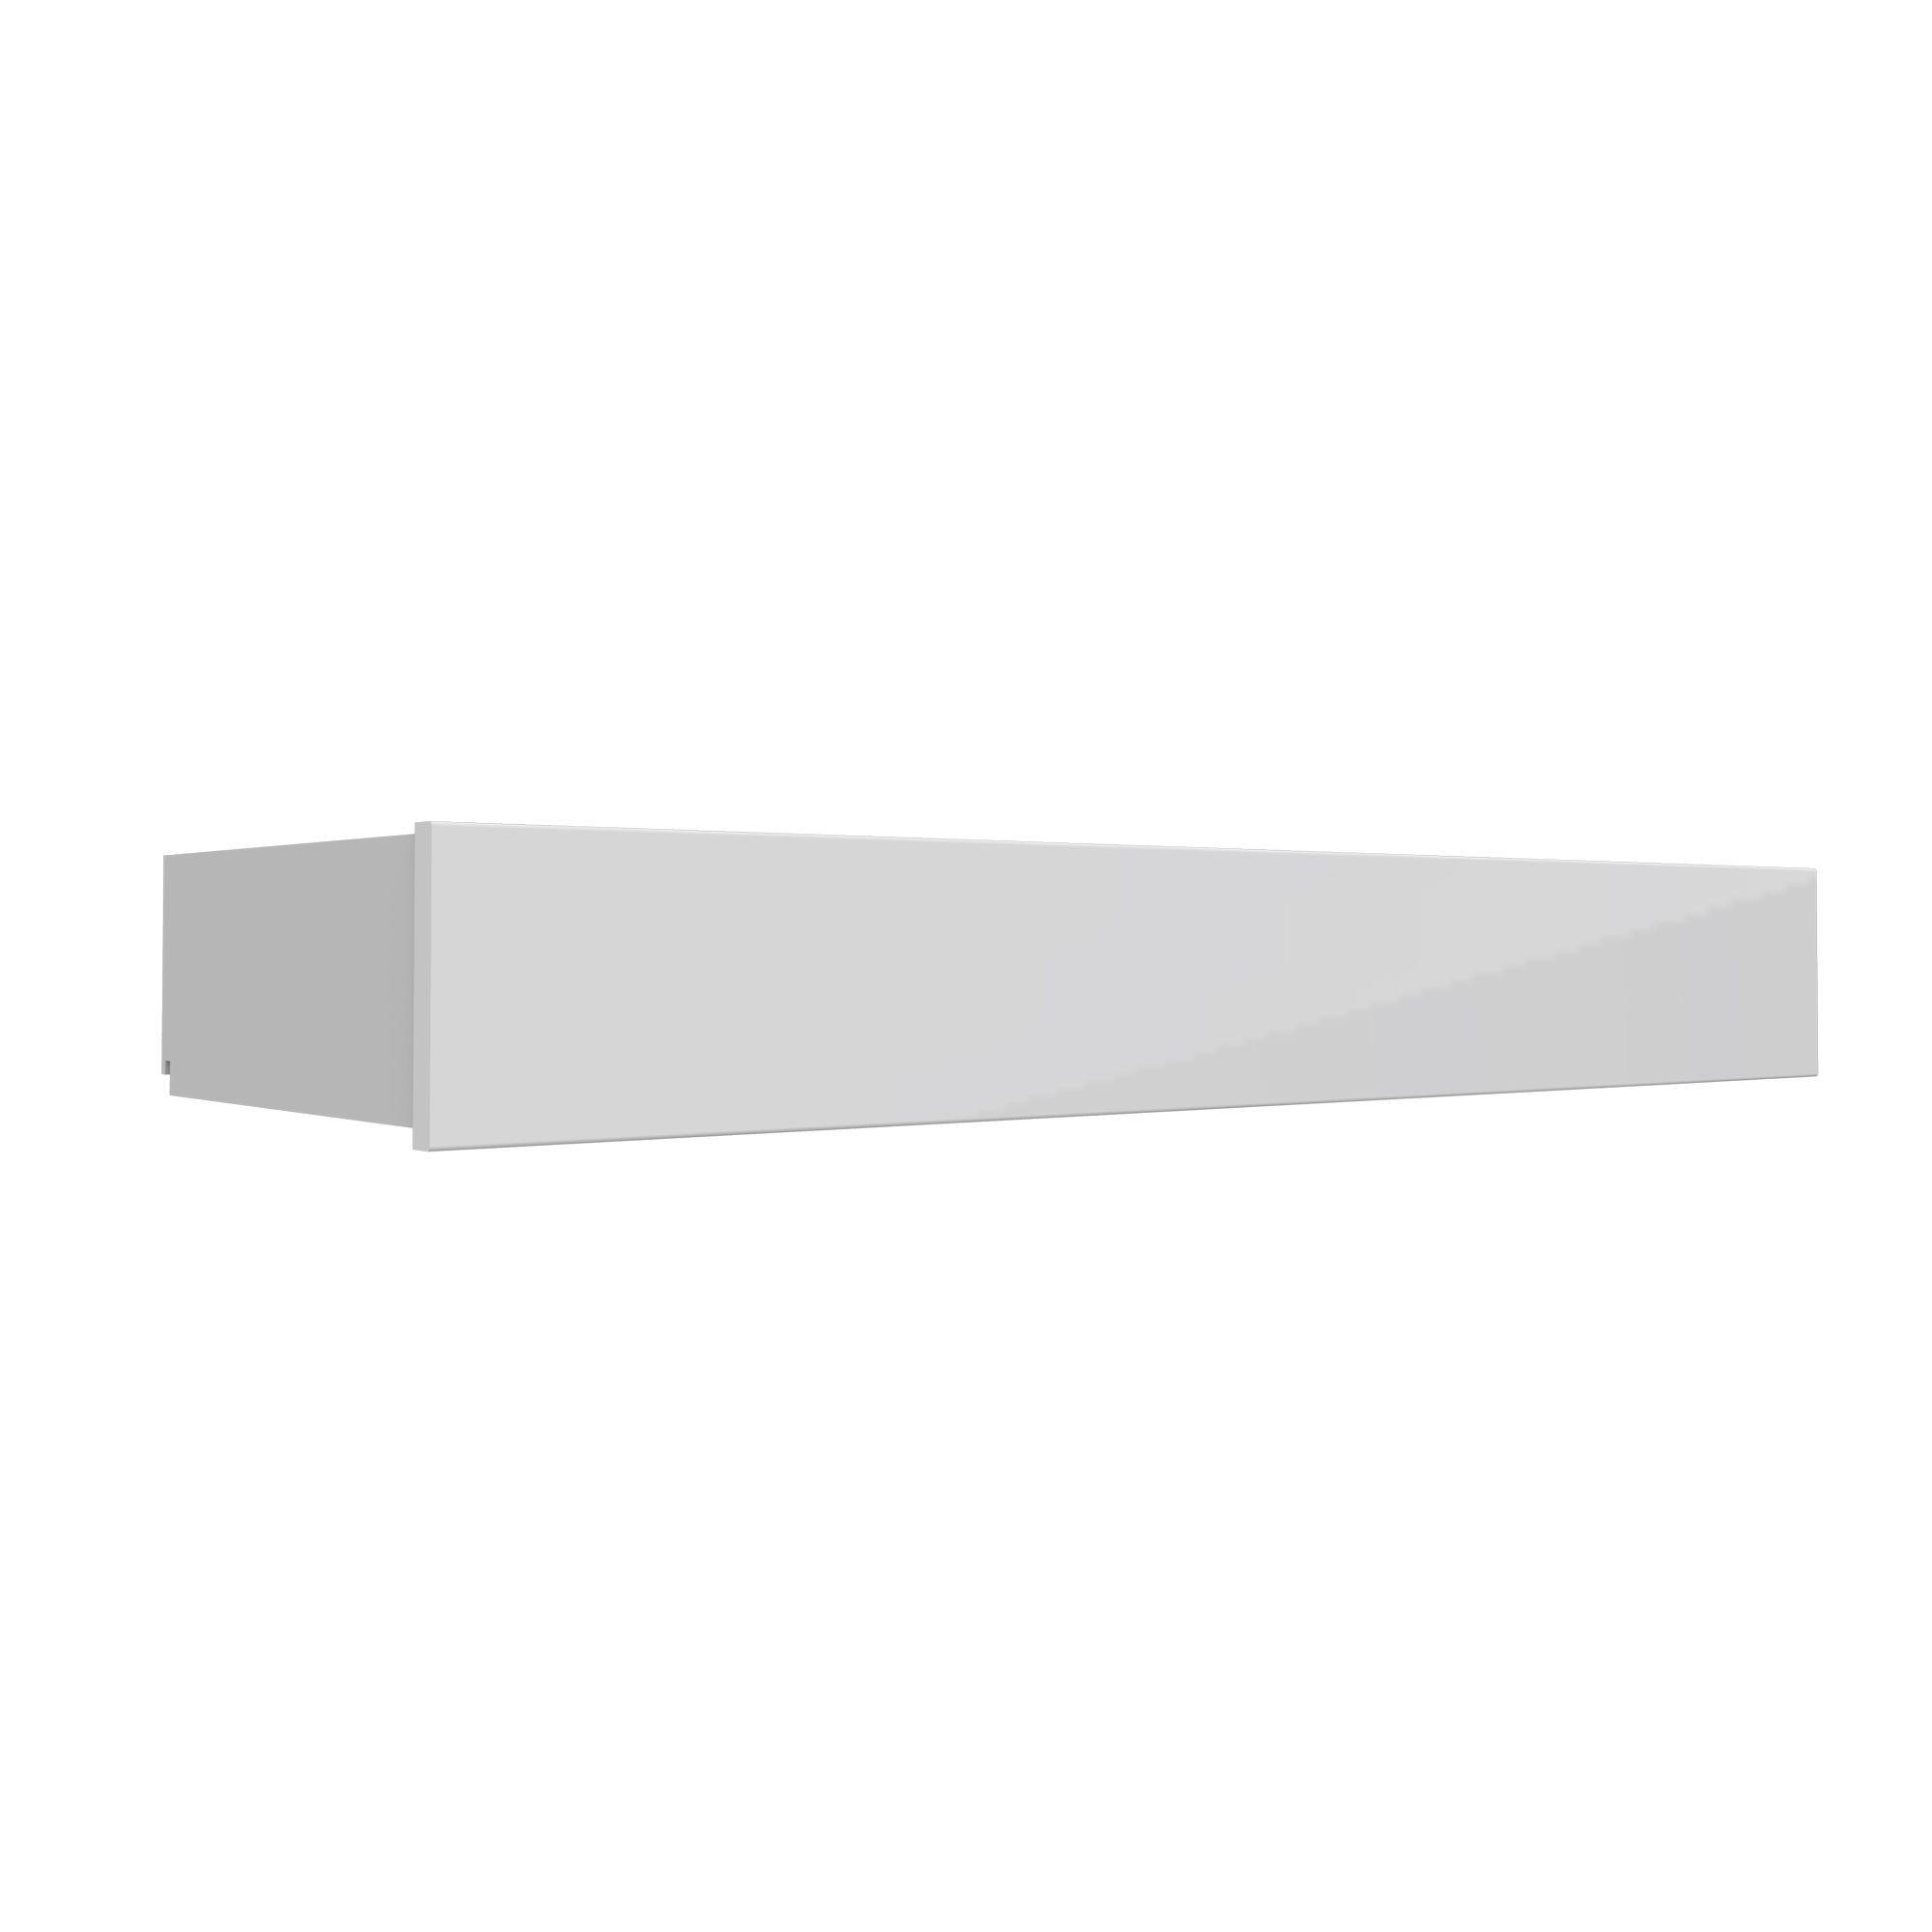 Darwin Modular White Internal Drawer (w) 1000mm (d) 374mm